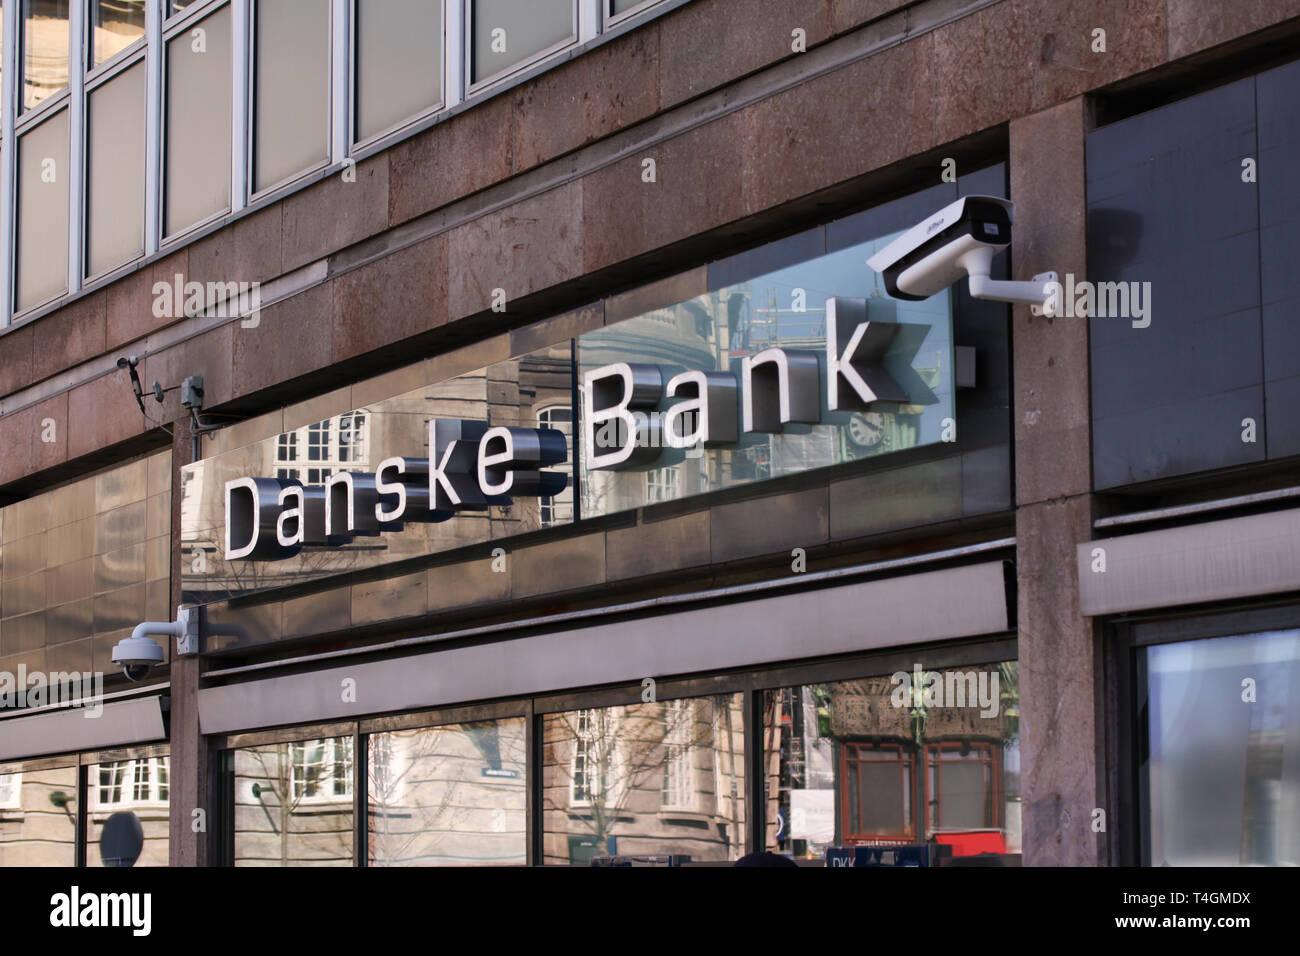 Danske bank logo on front of branch. Danske bank is the largest bank in Denmark and a major retail bank in the northern European region. Copenhagen, D - Stock Image